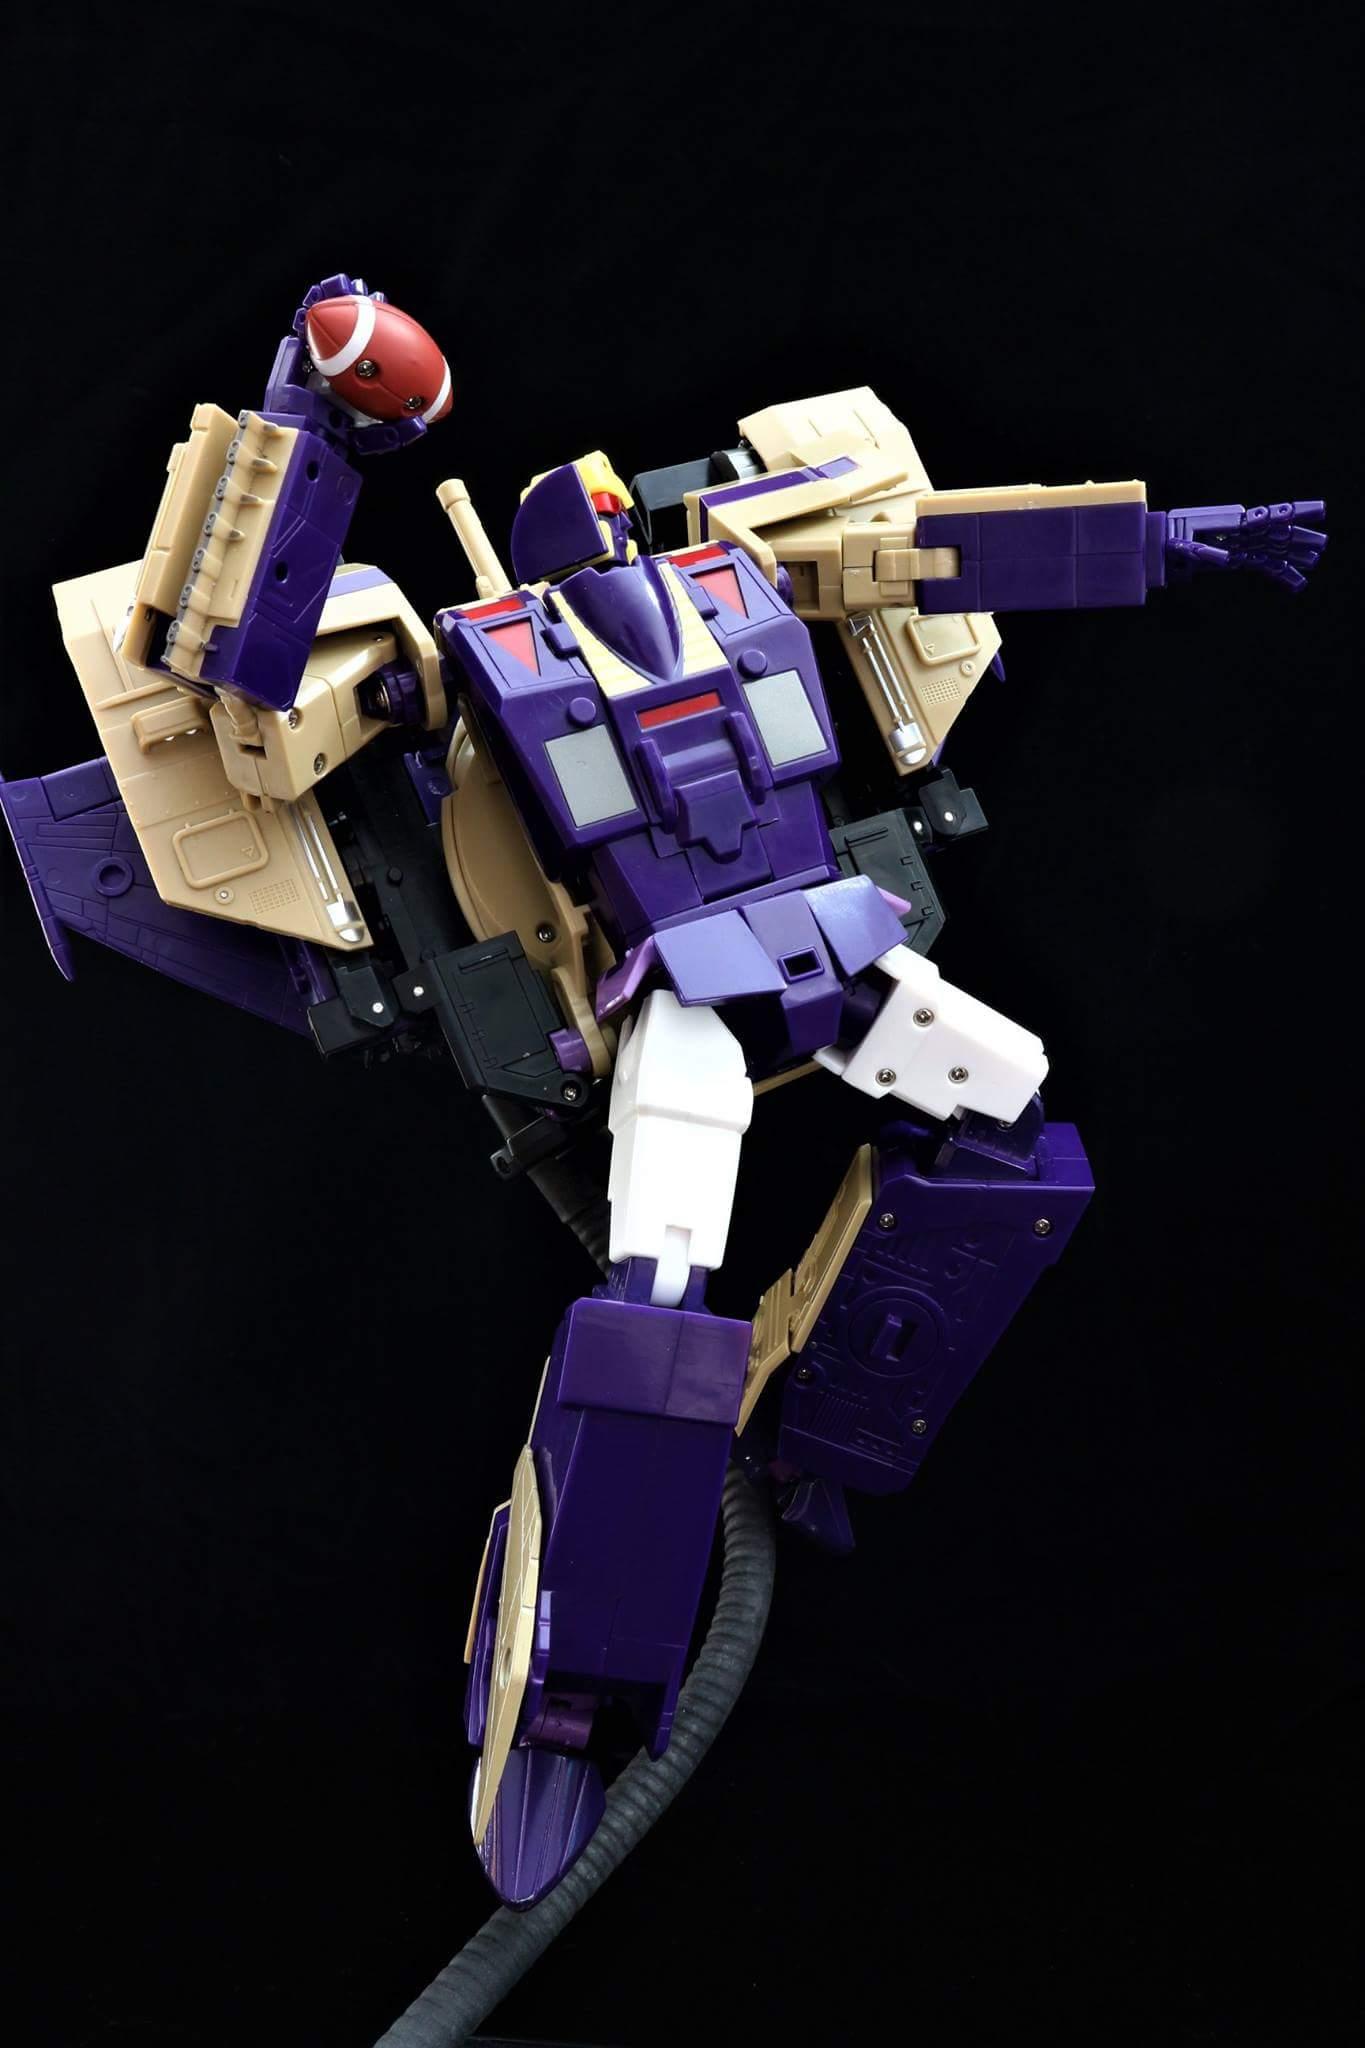 [KFC Toys] Produit Tiers - Jouet Phase 7-A Ditka - aka Blitzwing/Le Blitz - Page 3 V8WXud9P